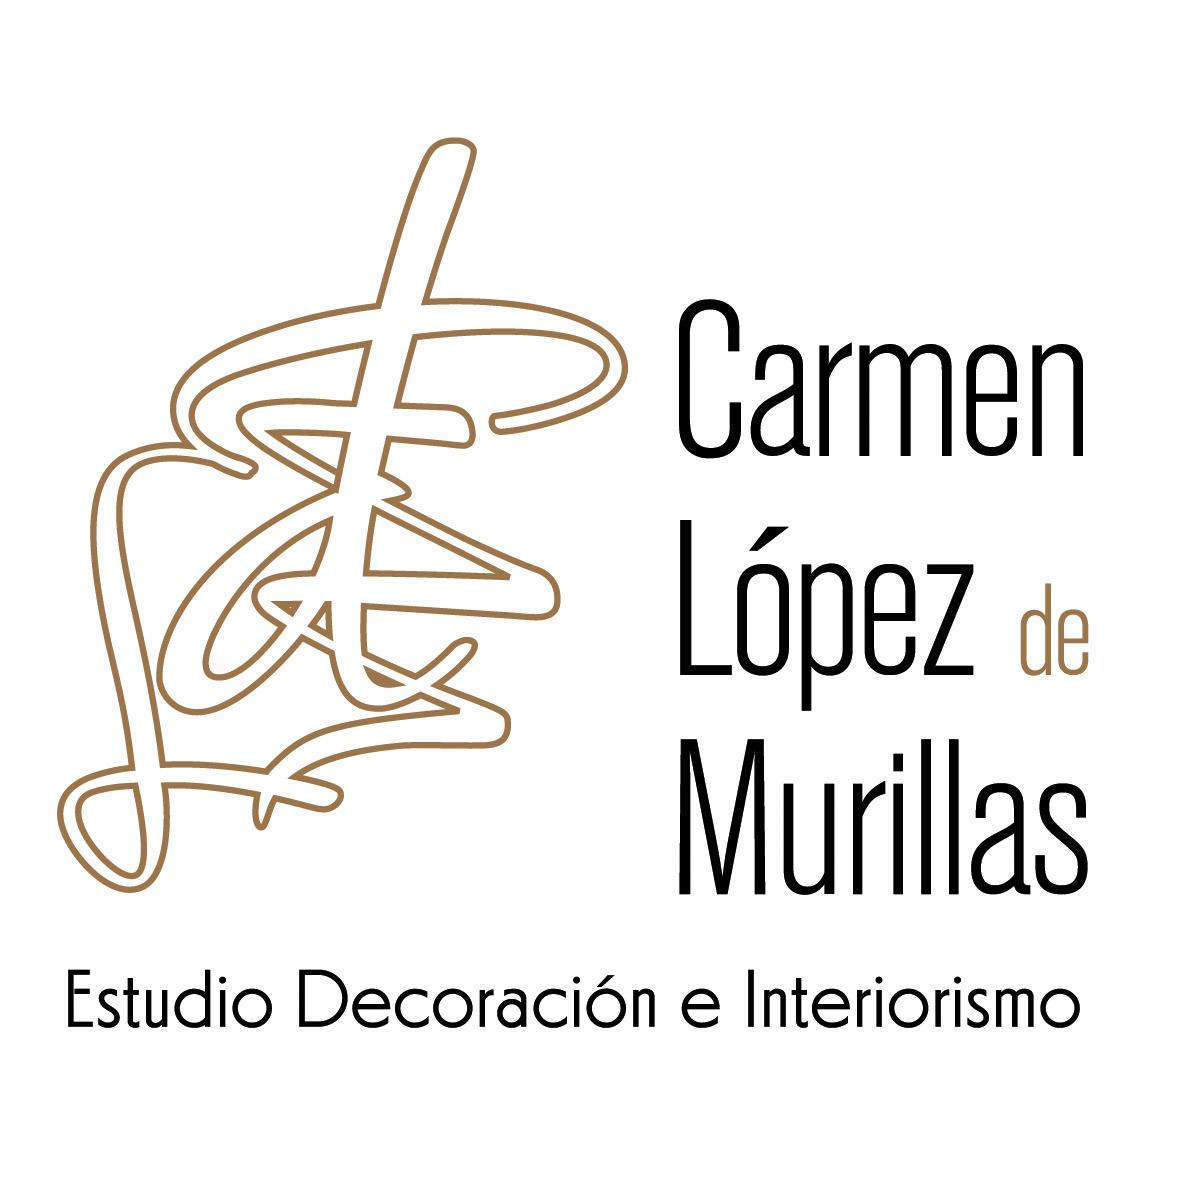 Diseñadora de Interiores - Carmen  López de Murillas